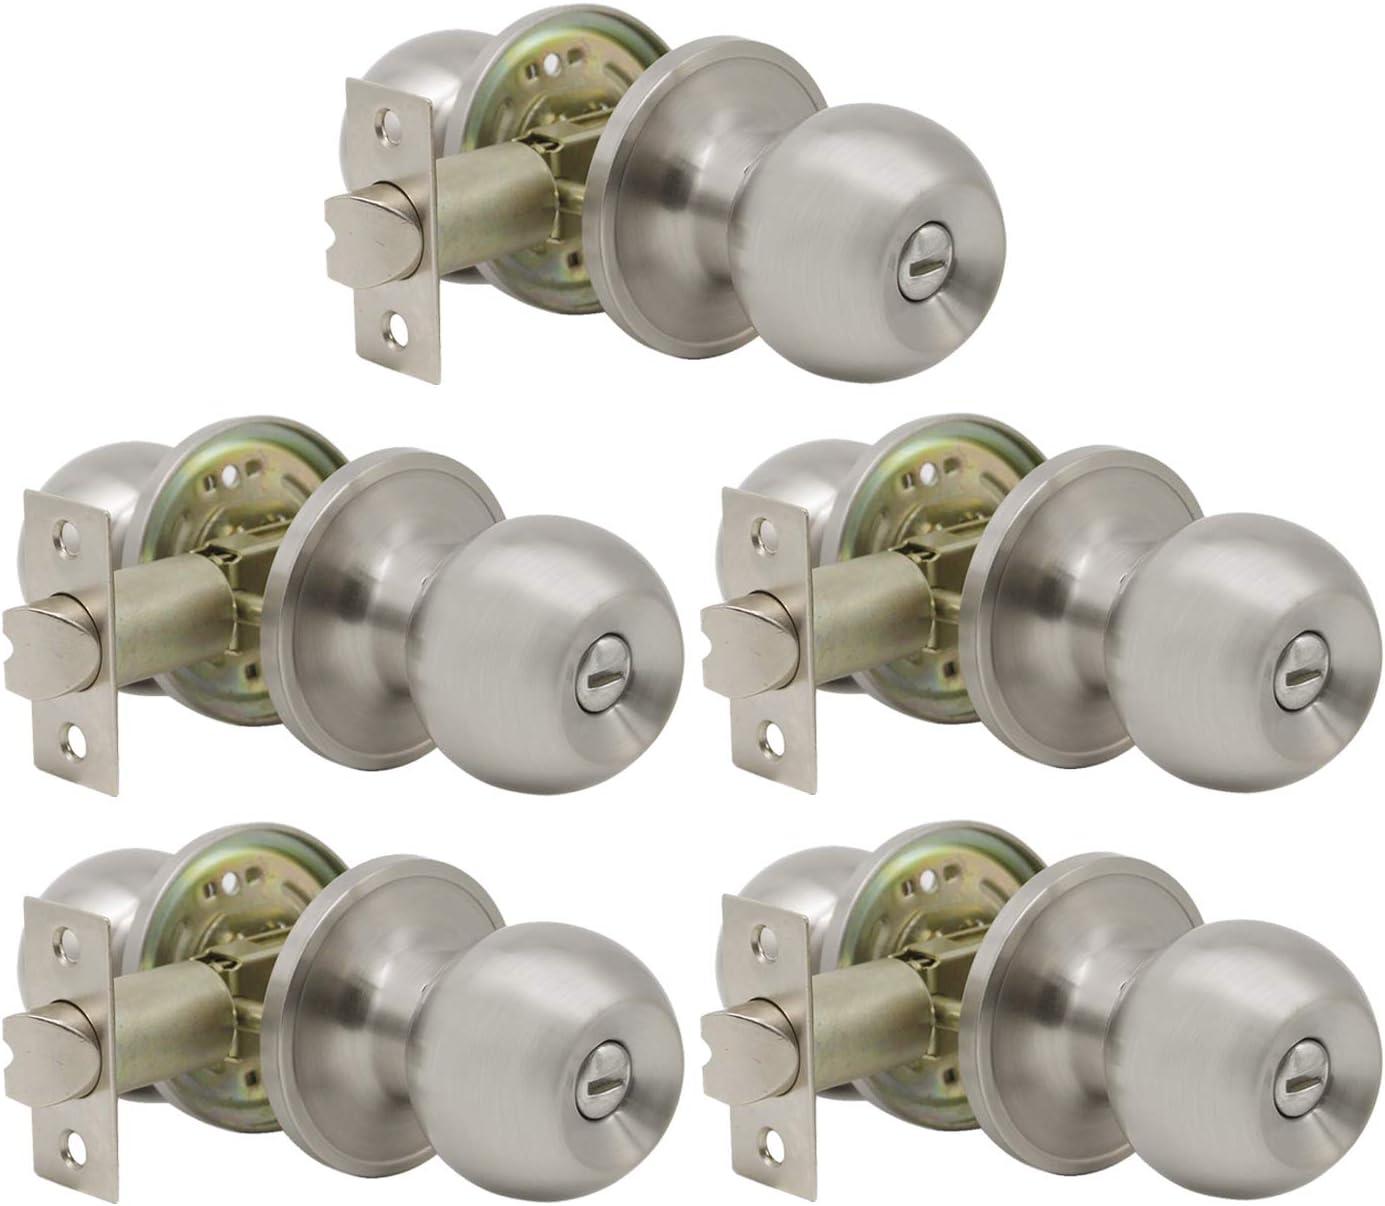 Gobrico 5 Pack Round Ball Bathroom and Bedroom Door Hardware Privacy Locksets Knobs Satin Nickel Finished Keyless Interior Door Locks